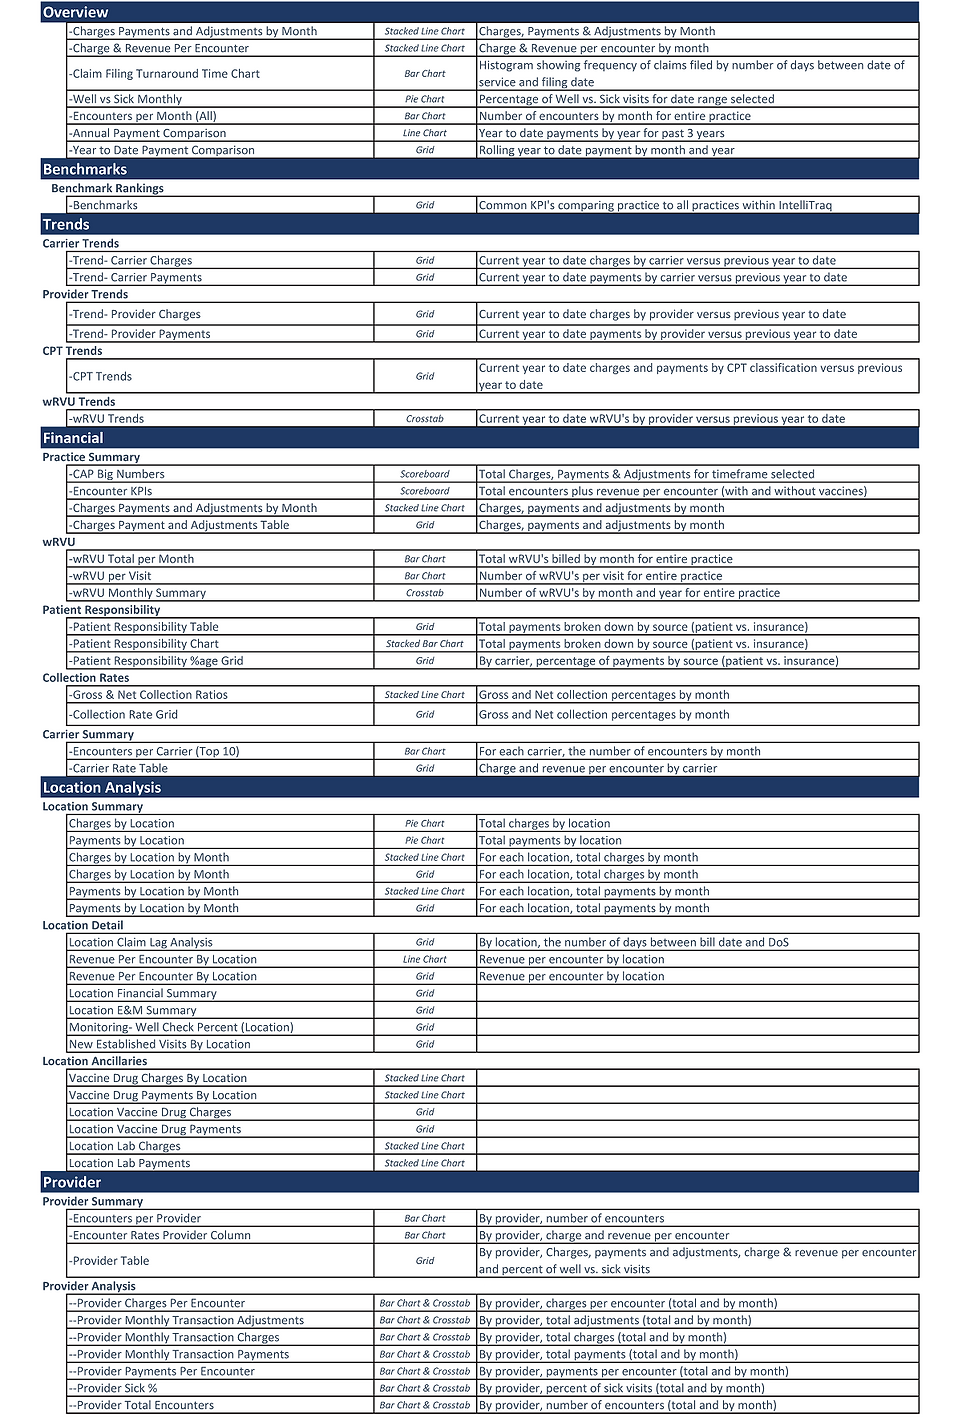 PMI_IntelliTraq_Inventory_P1_V2020.png